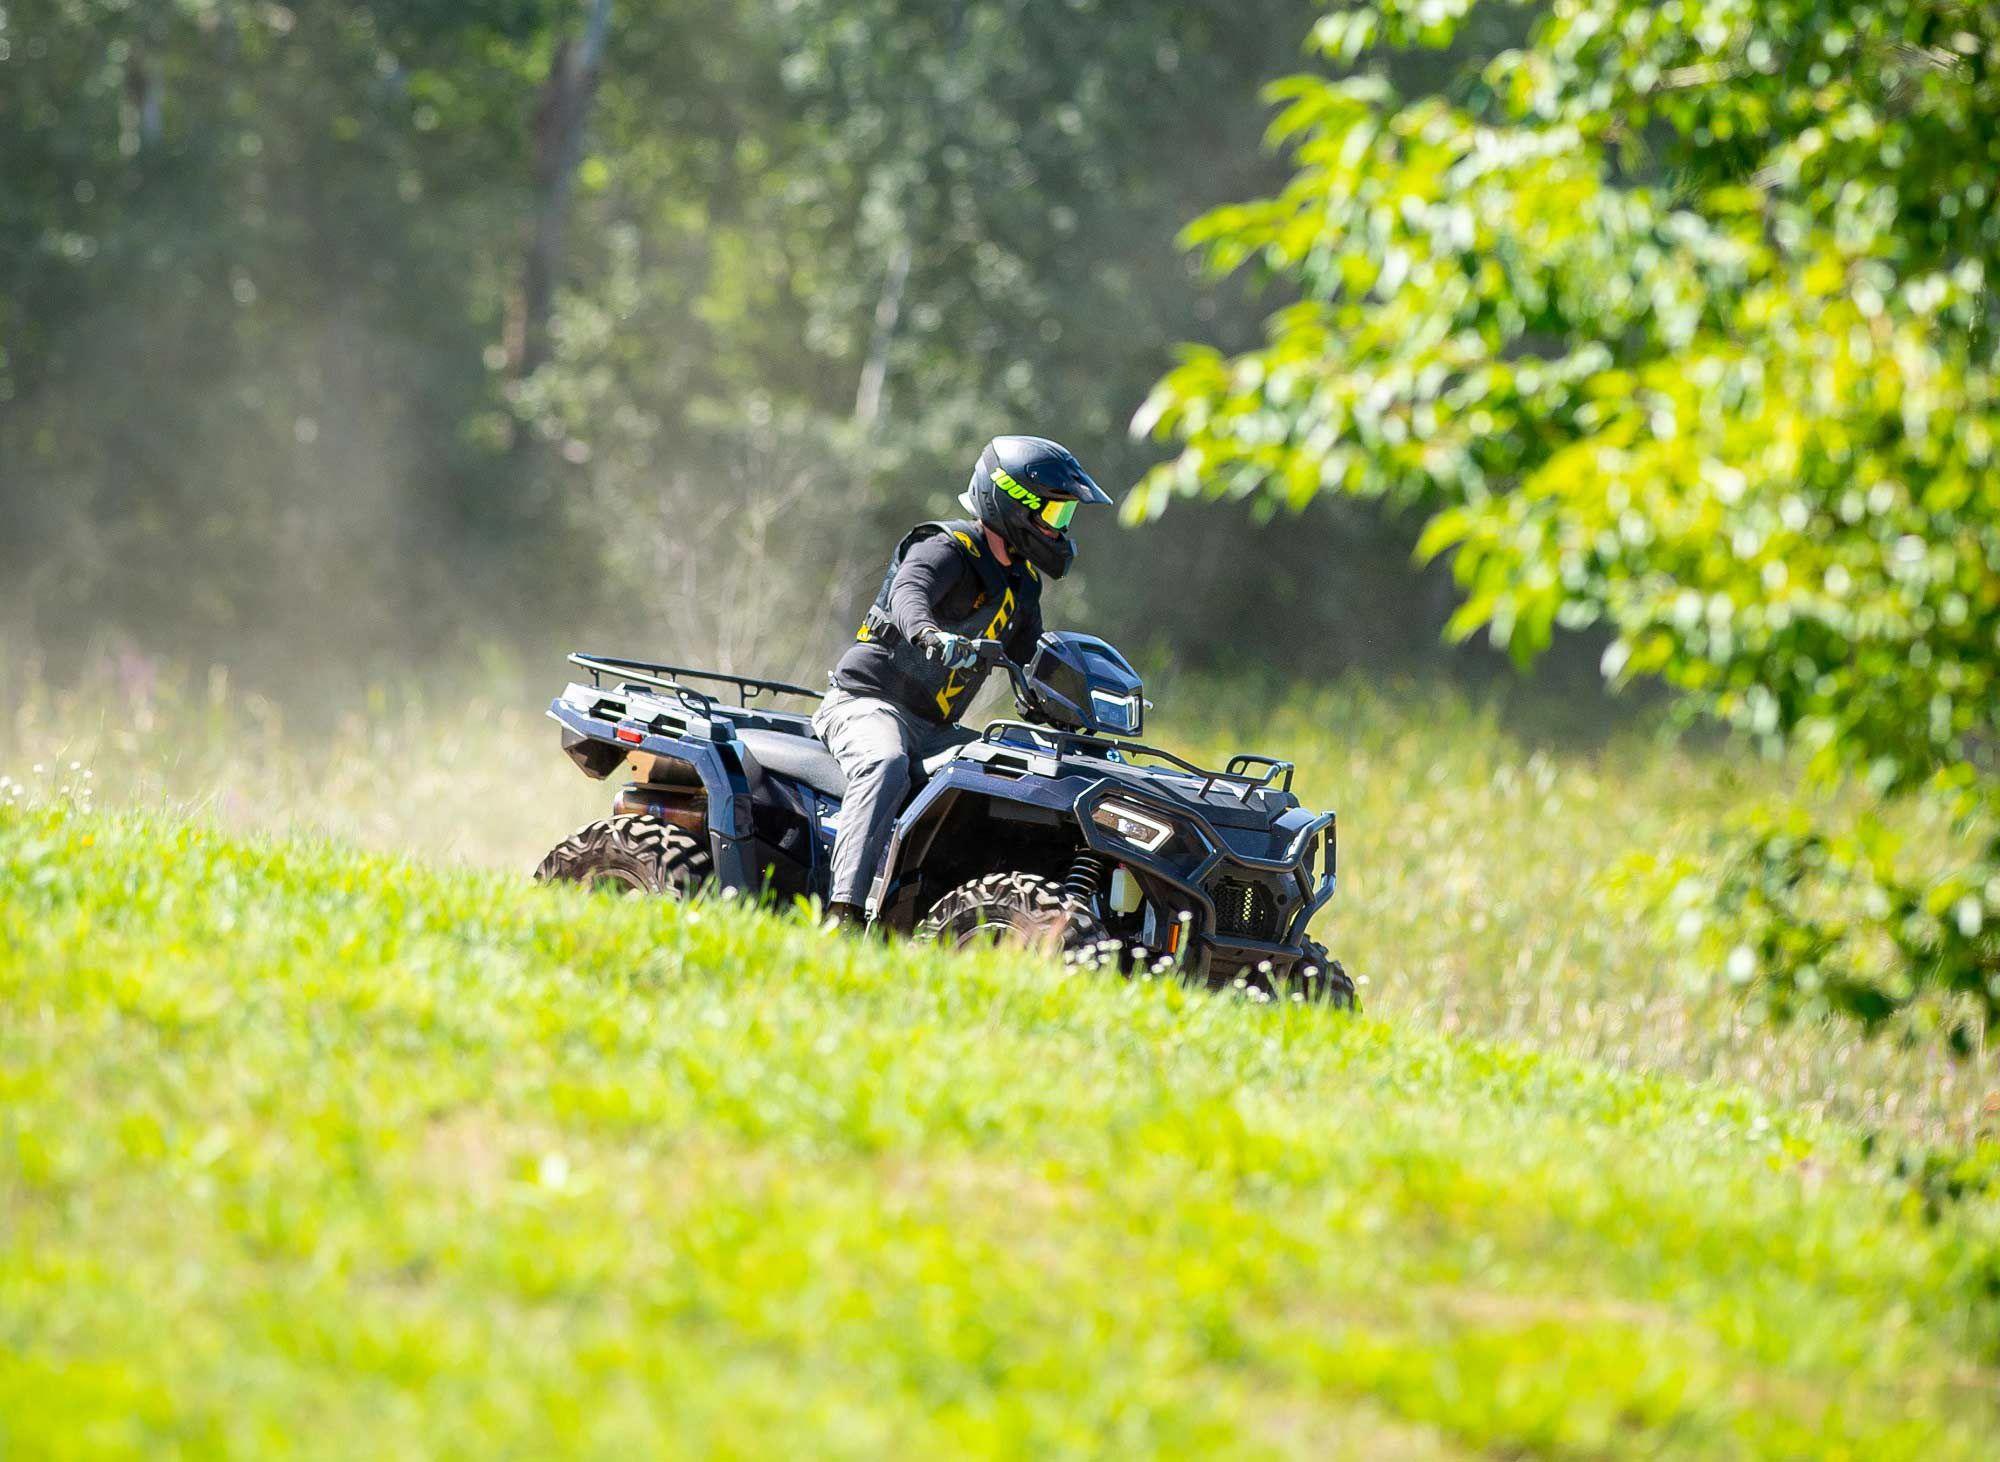 Minnesota is bringing ATV trails to the people.